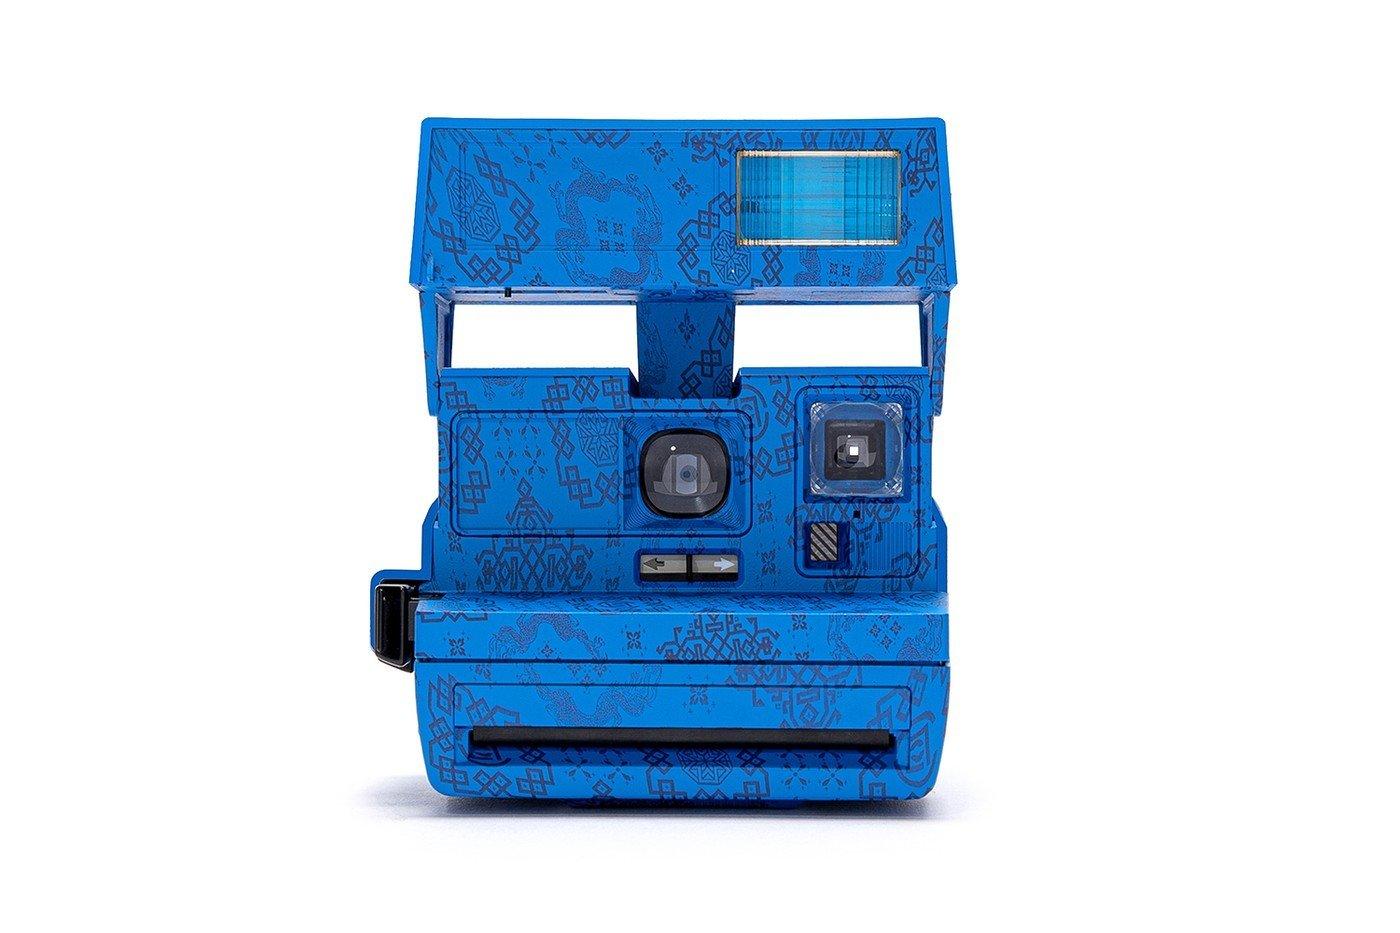 CLOT x Polaroid 600 全新联乘 丝绸 拍立得相机发布